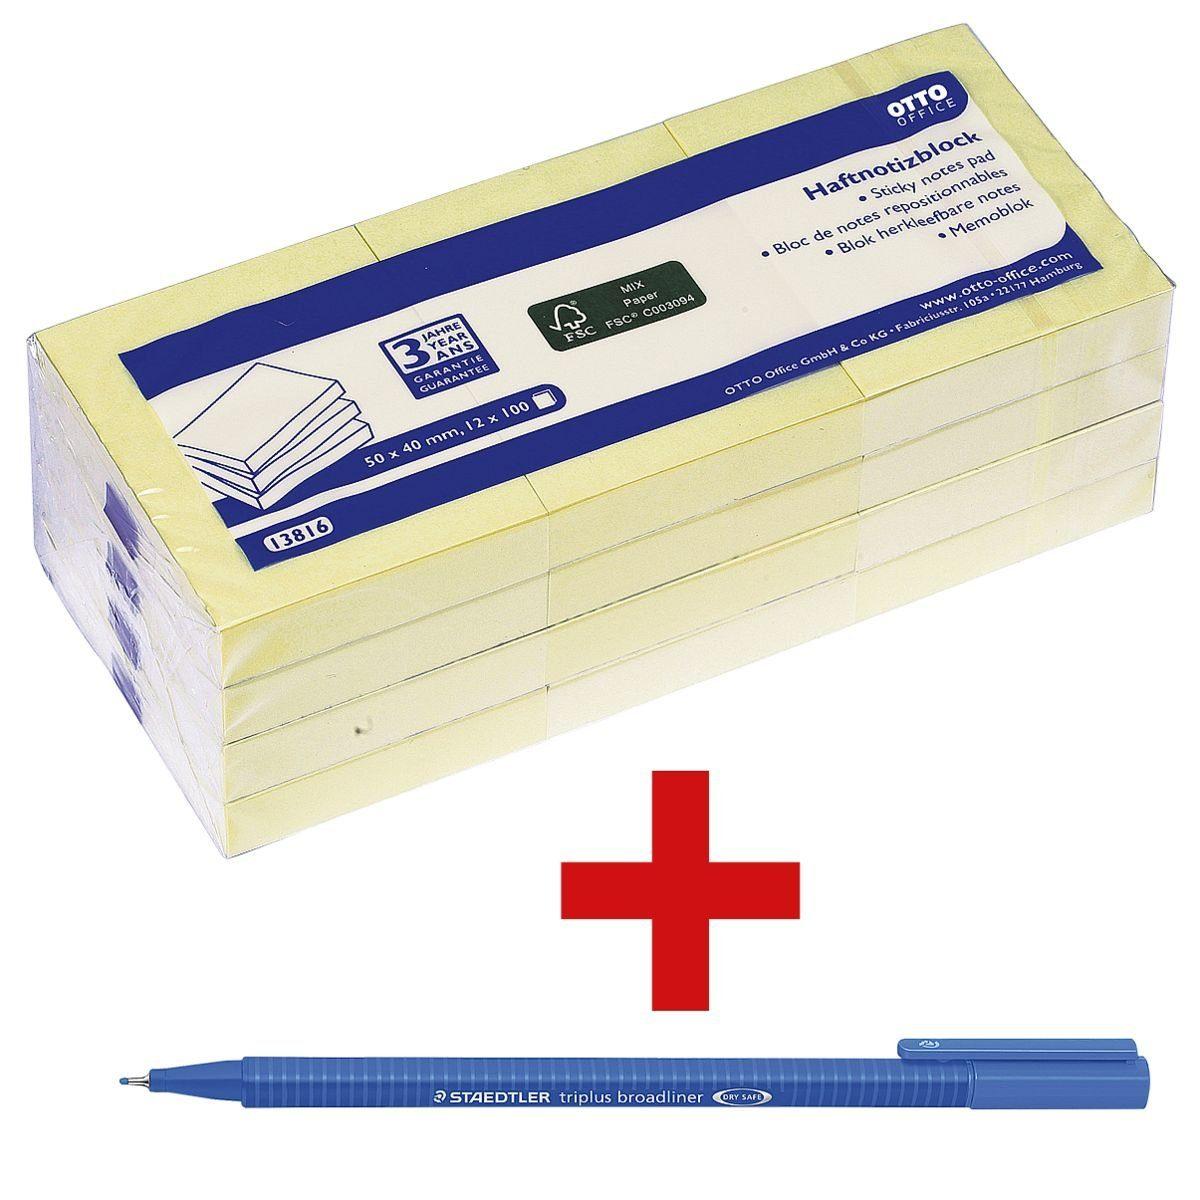 OTTOOFFICE STANDARD Haftnotizblock 5,0 x 4,0 cm, 12 Stück inkl. 1 Broadliner »triplus« 1 Set